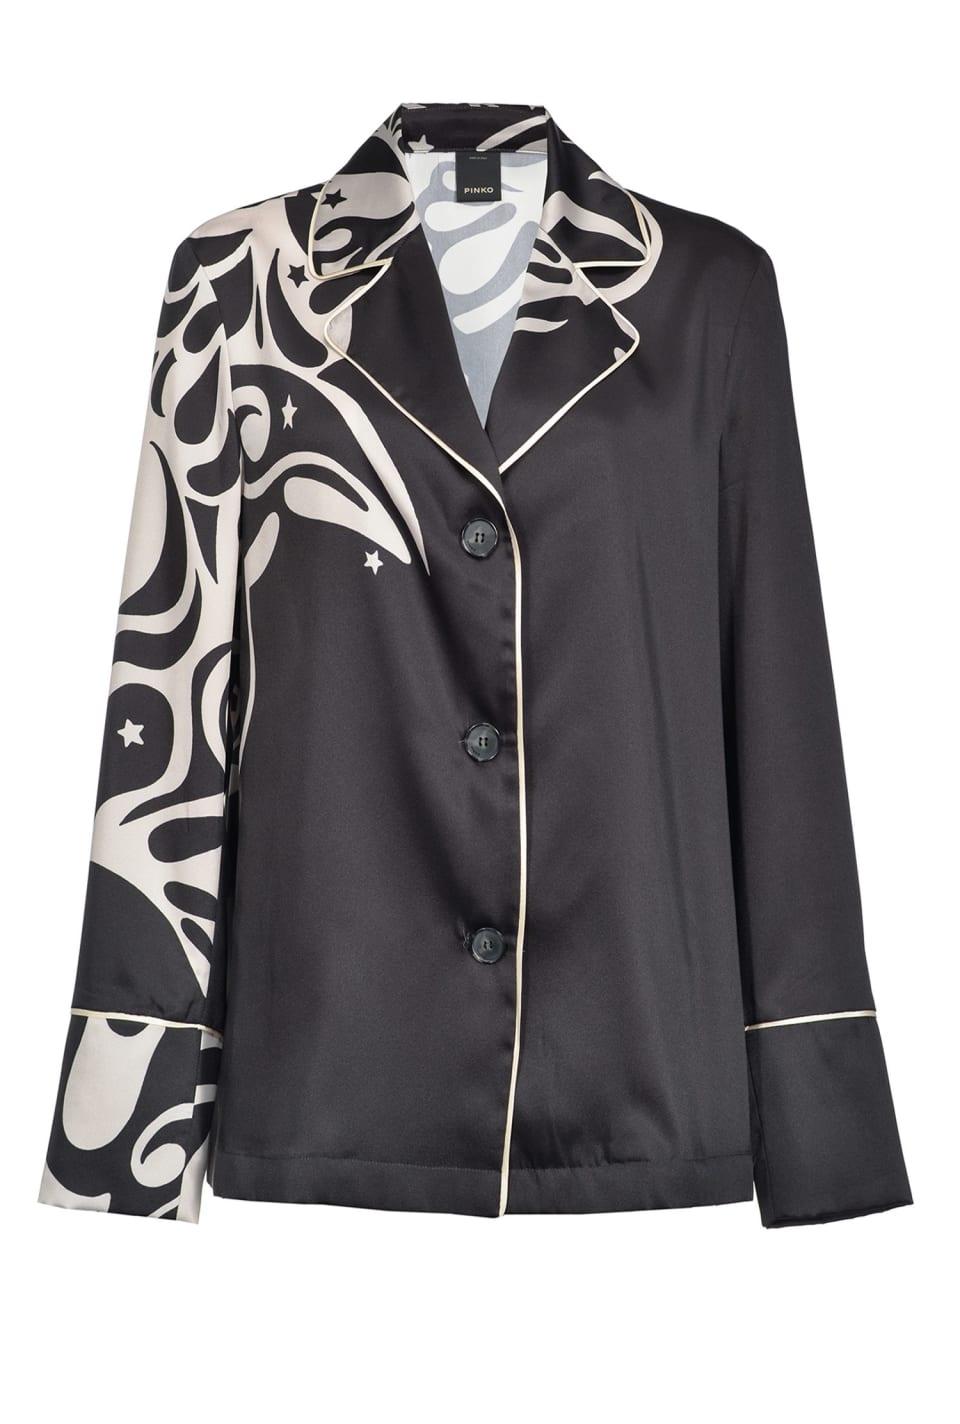 Japan print jacket